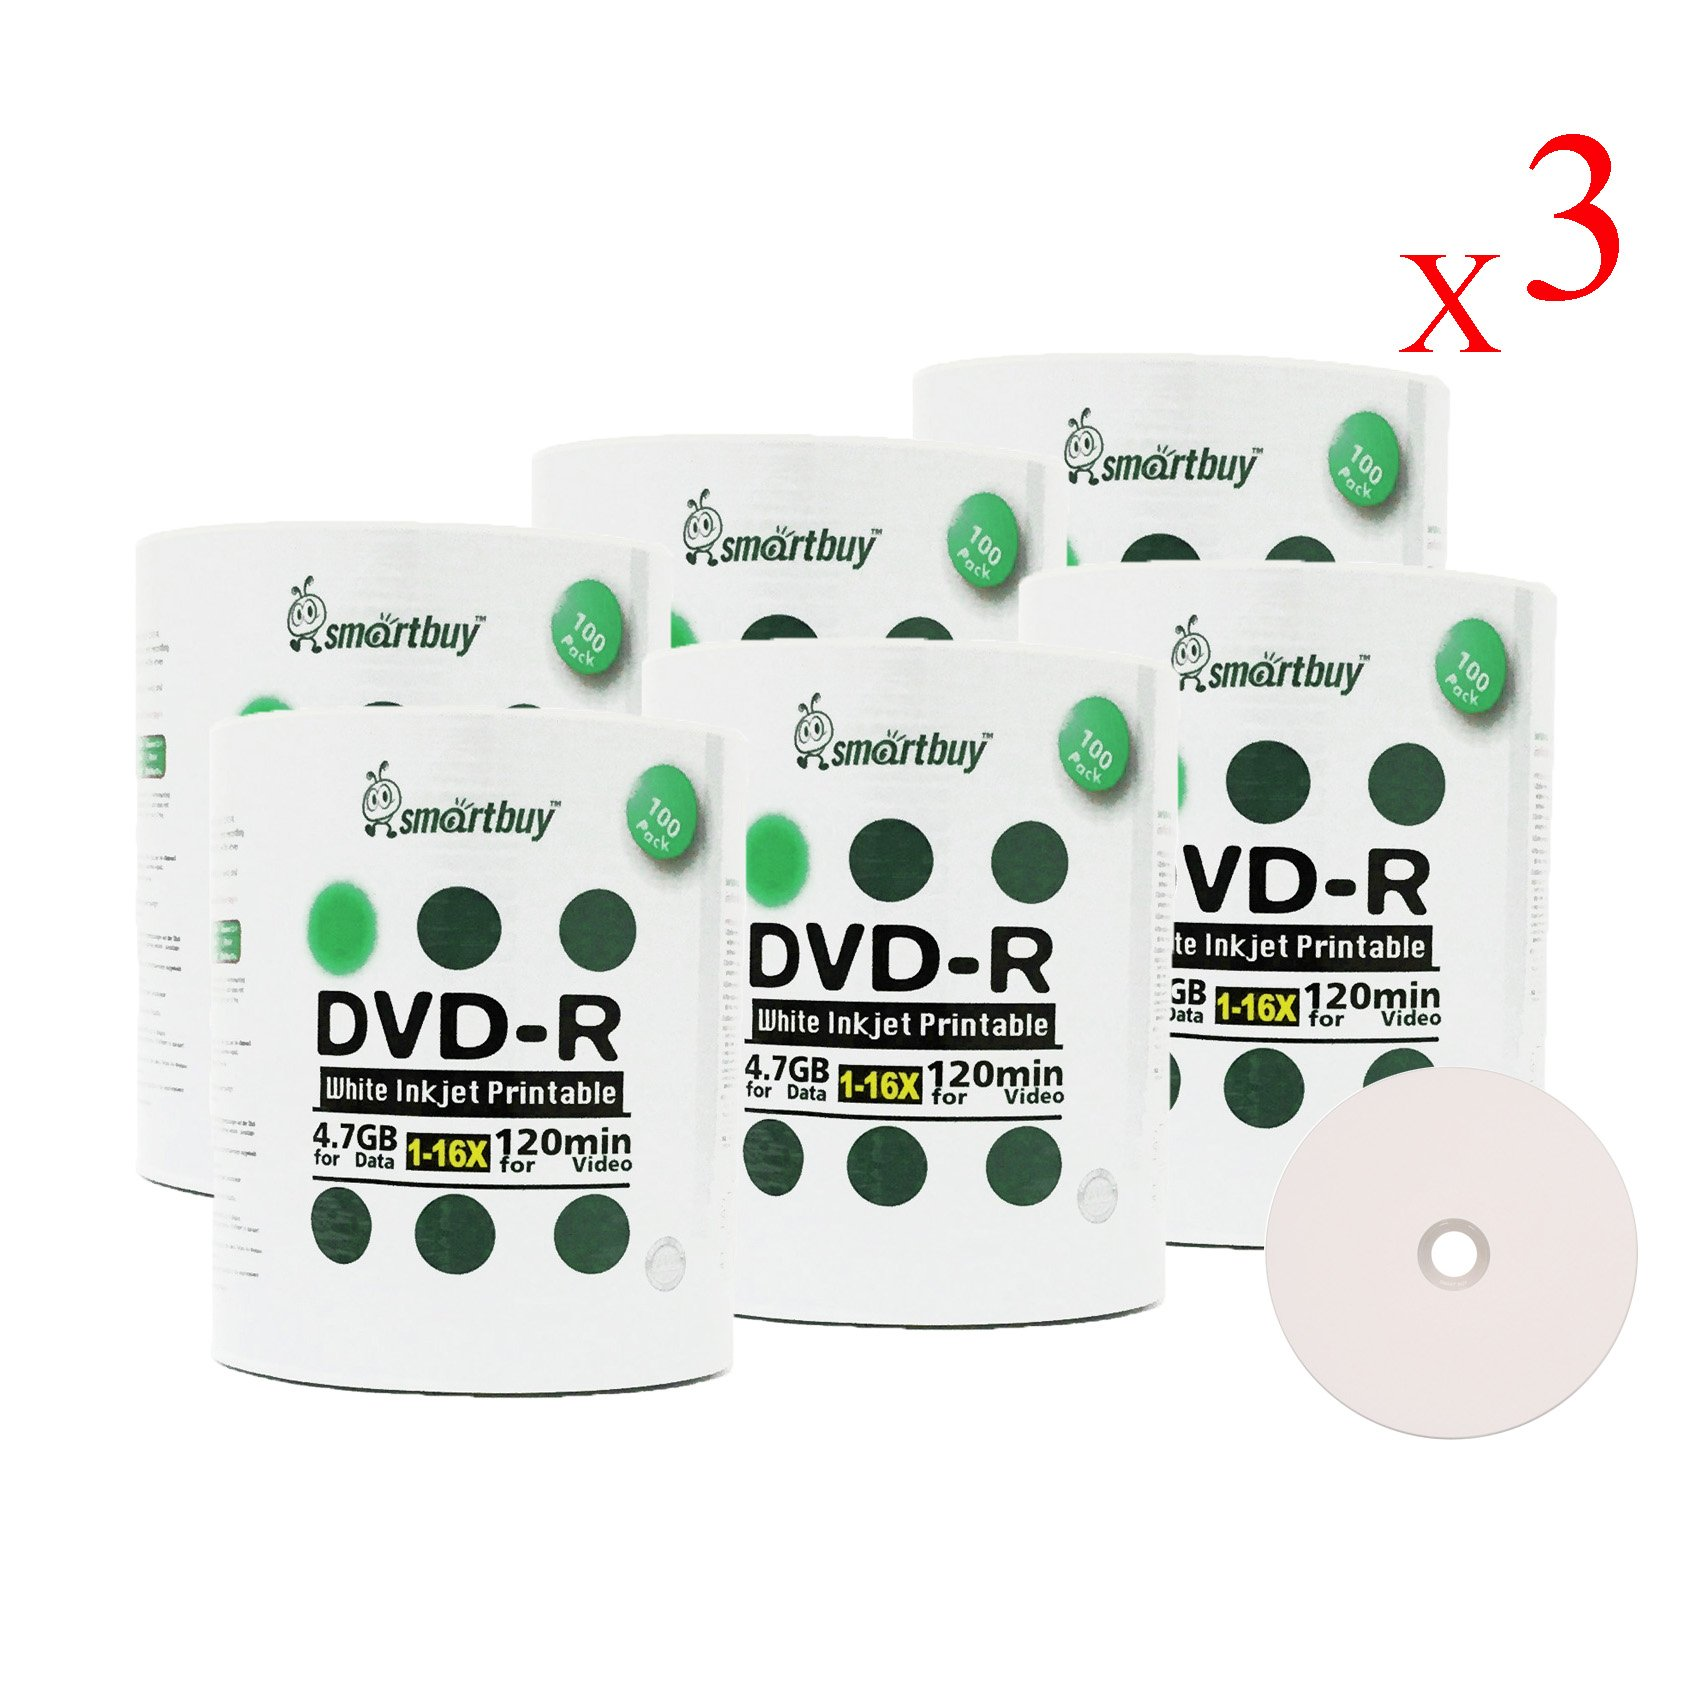 Smartbuy 1800-disc 4.7gb/120min 16x DVD-R White Inkjet Hub Printable Blank Data Recordable Media Disc by Smartbuy